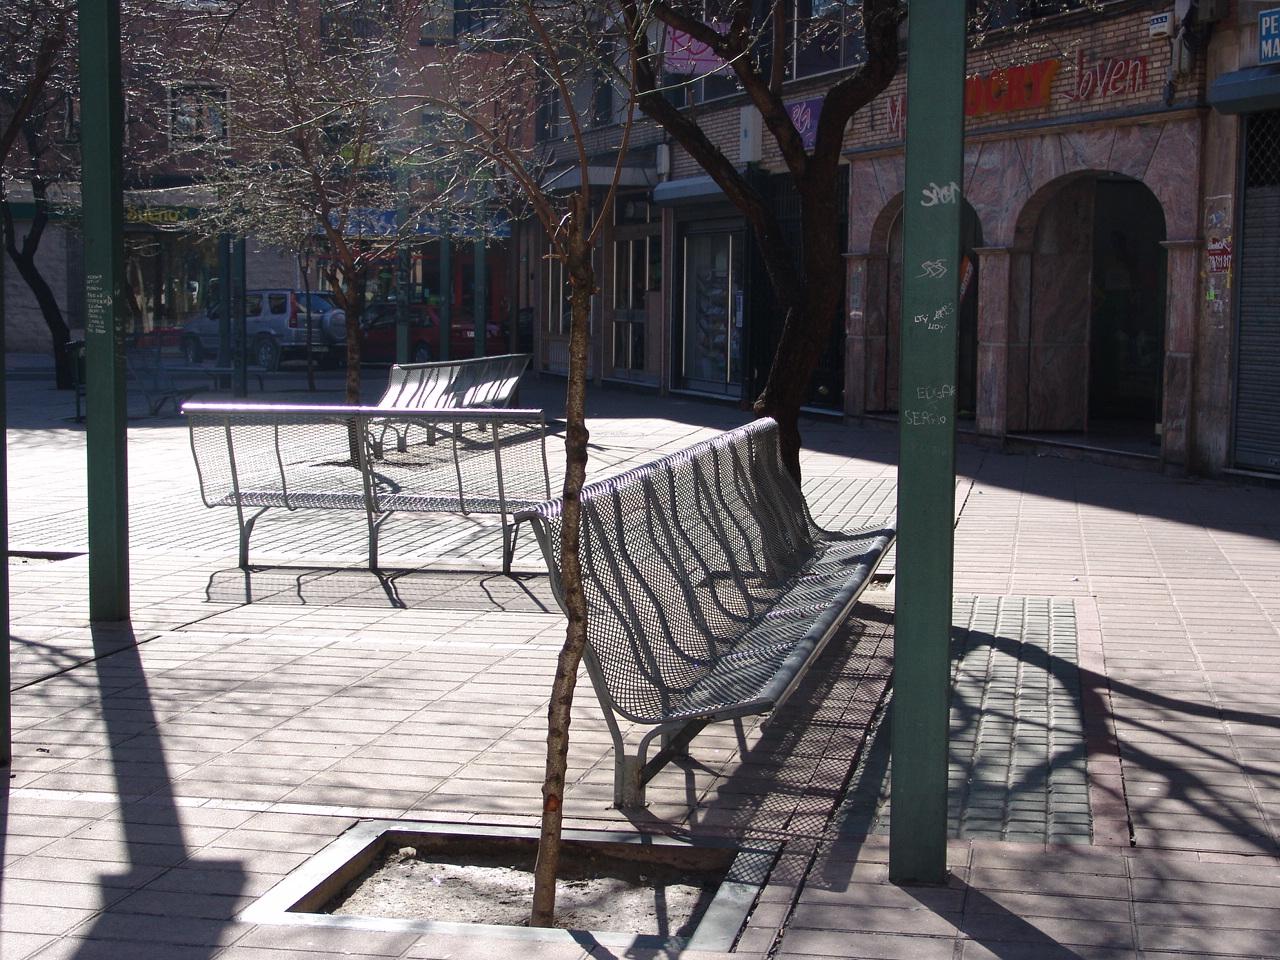 Juluis-mobiliario-urbano-04